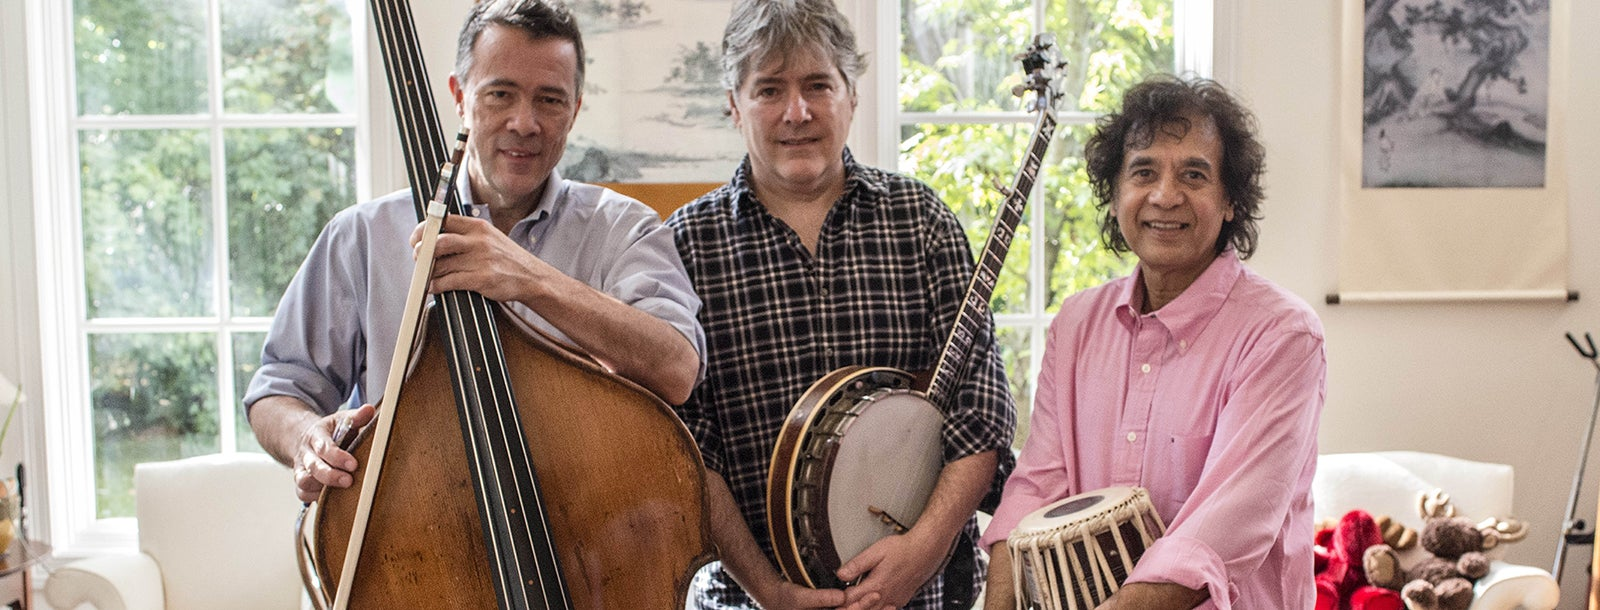 Béla Fleck, Zakir Hussain & Edgar Meyer with special guest Rakesh Chaurasia